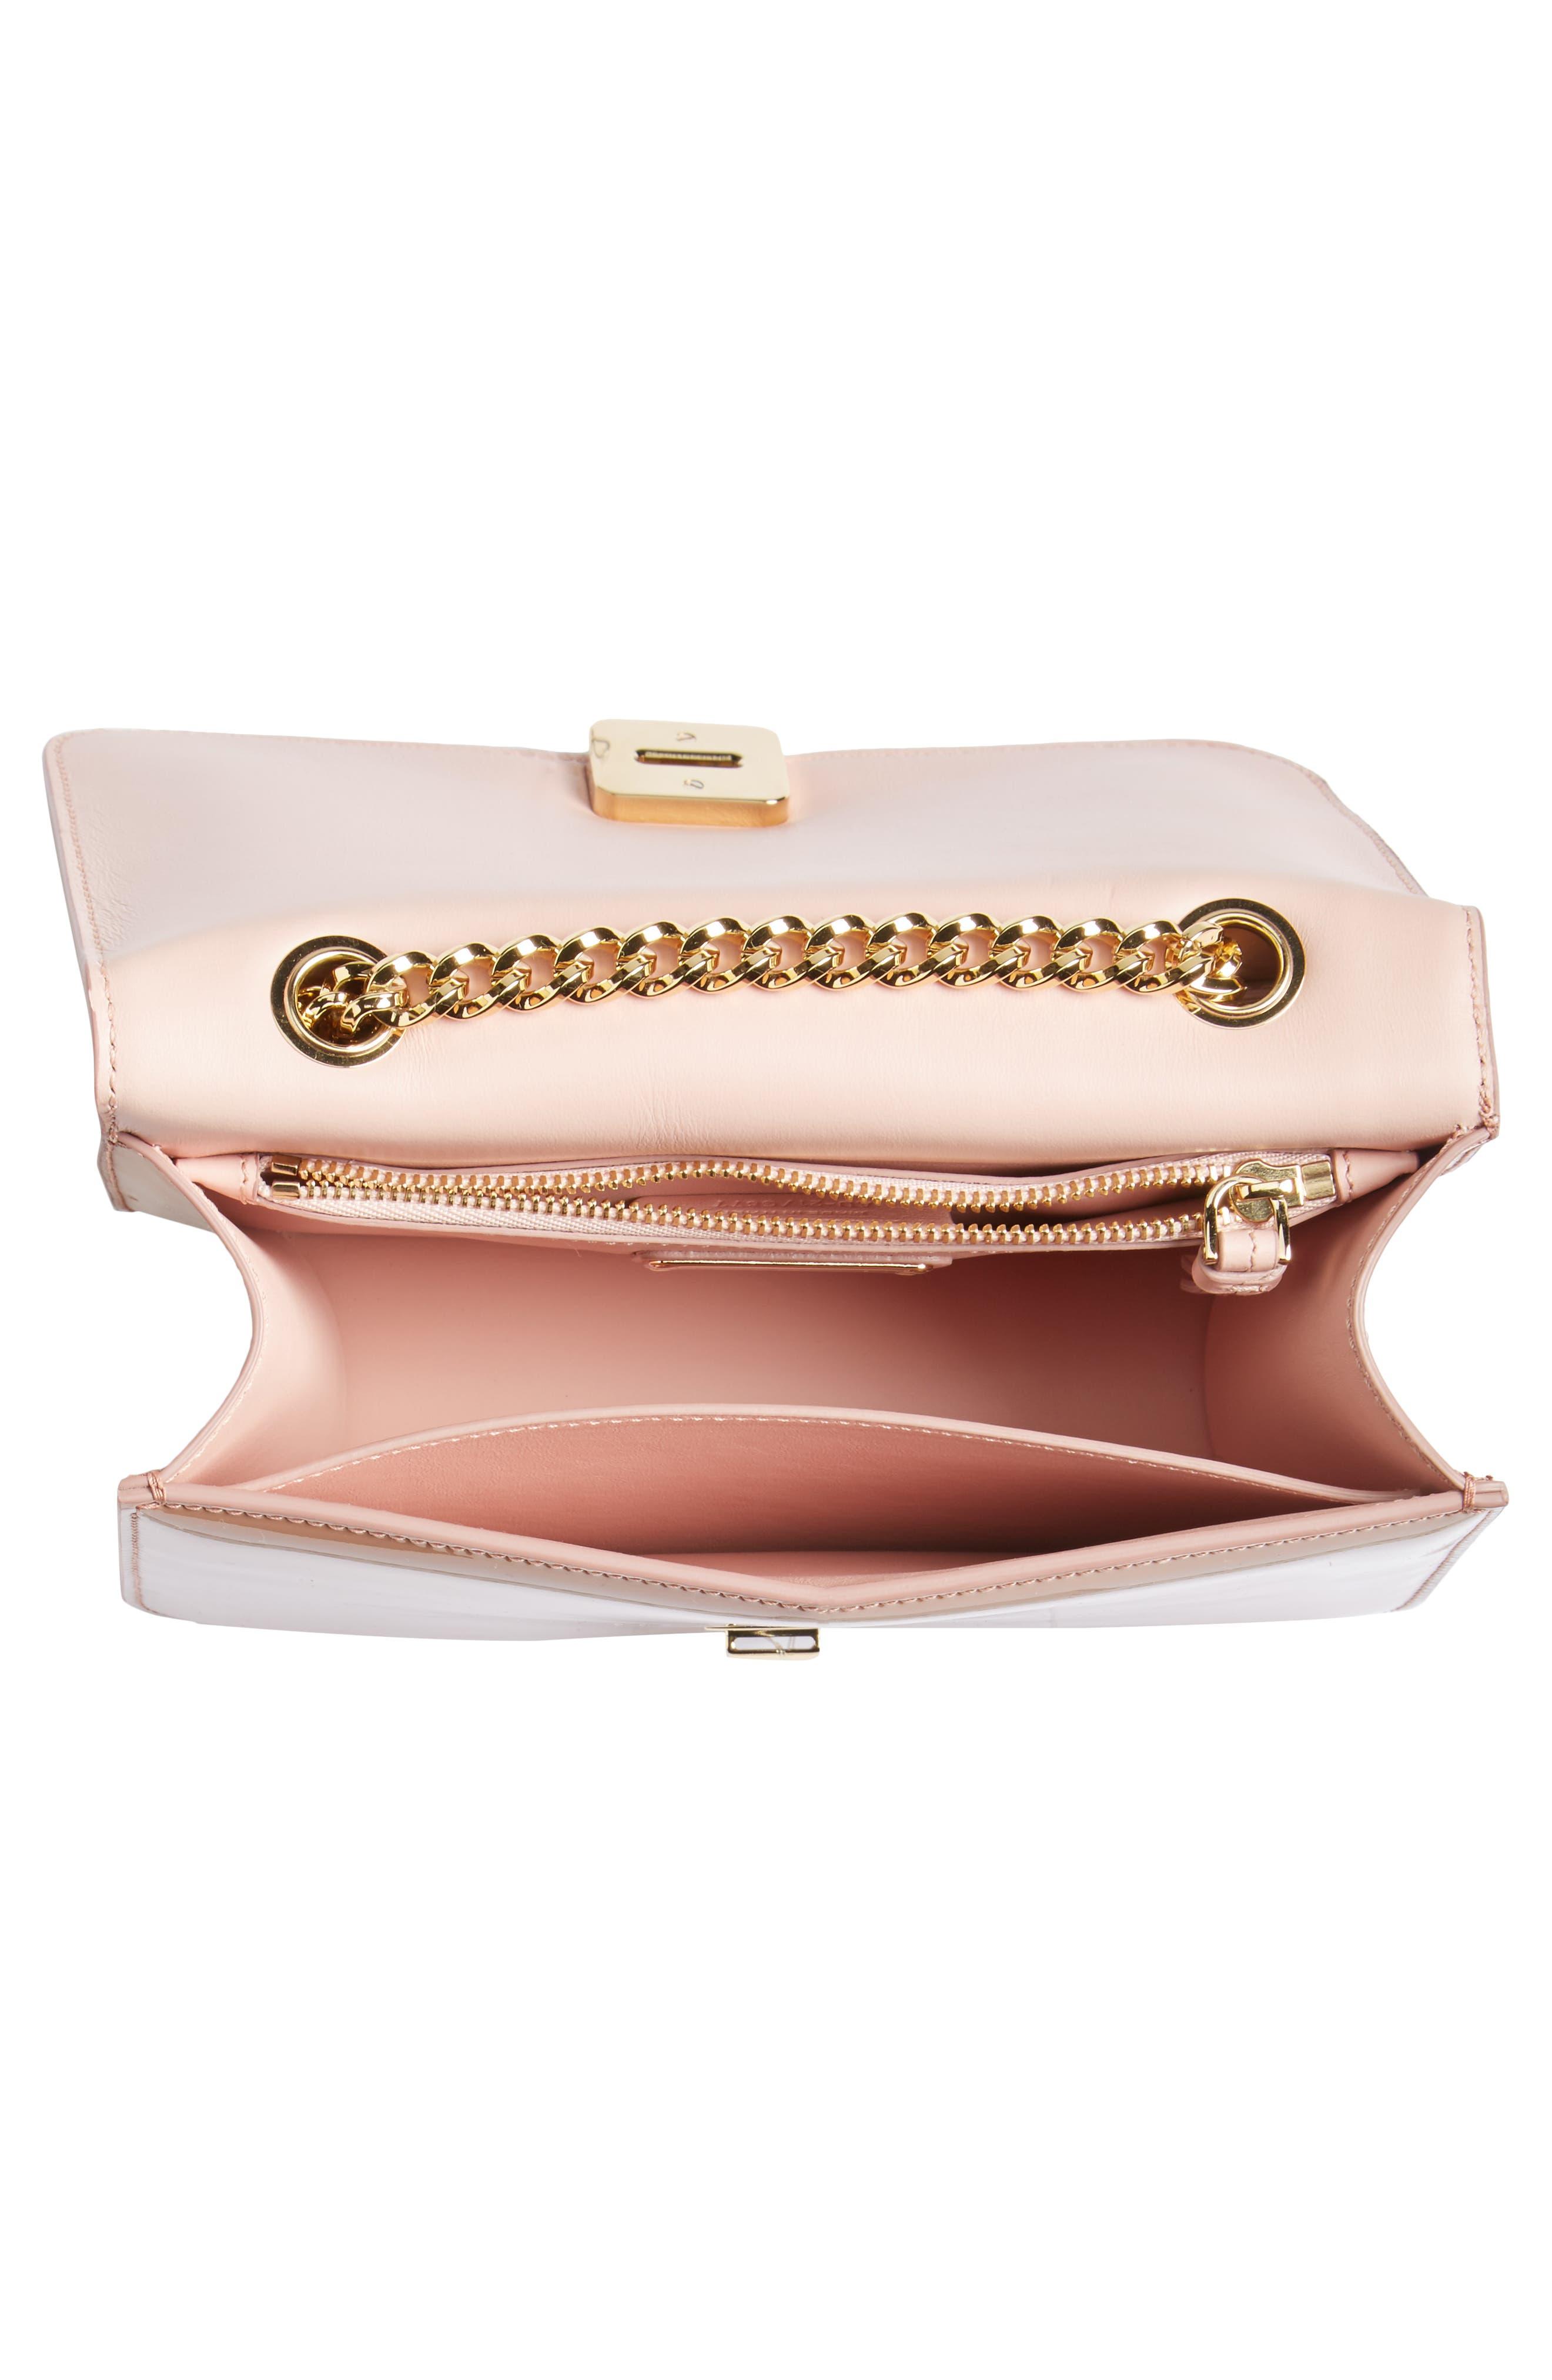 Vara Patent Leather Shoulder Bag,                             Alternate thumbnail 4, color,                             New Blush/ Bonbon